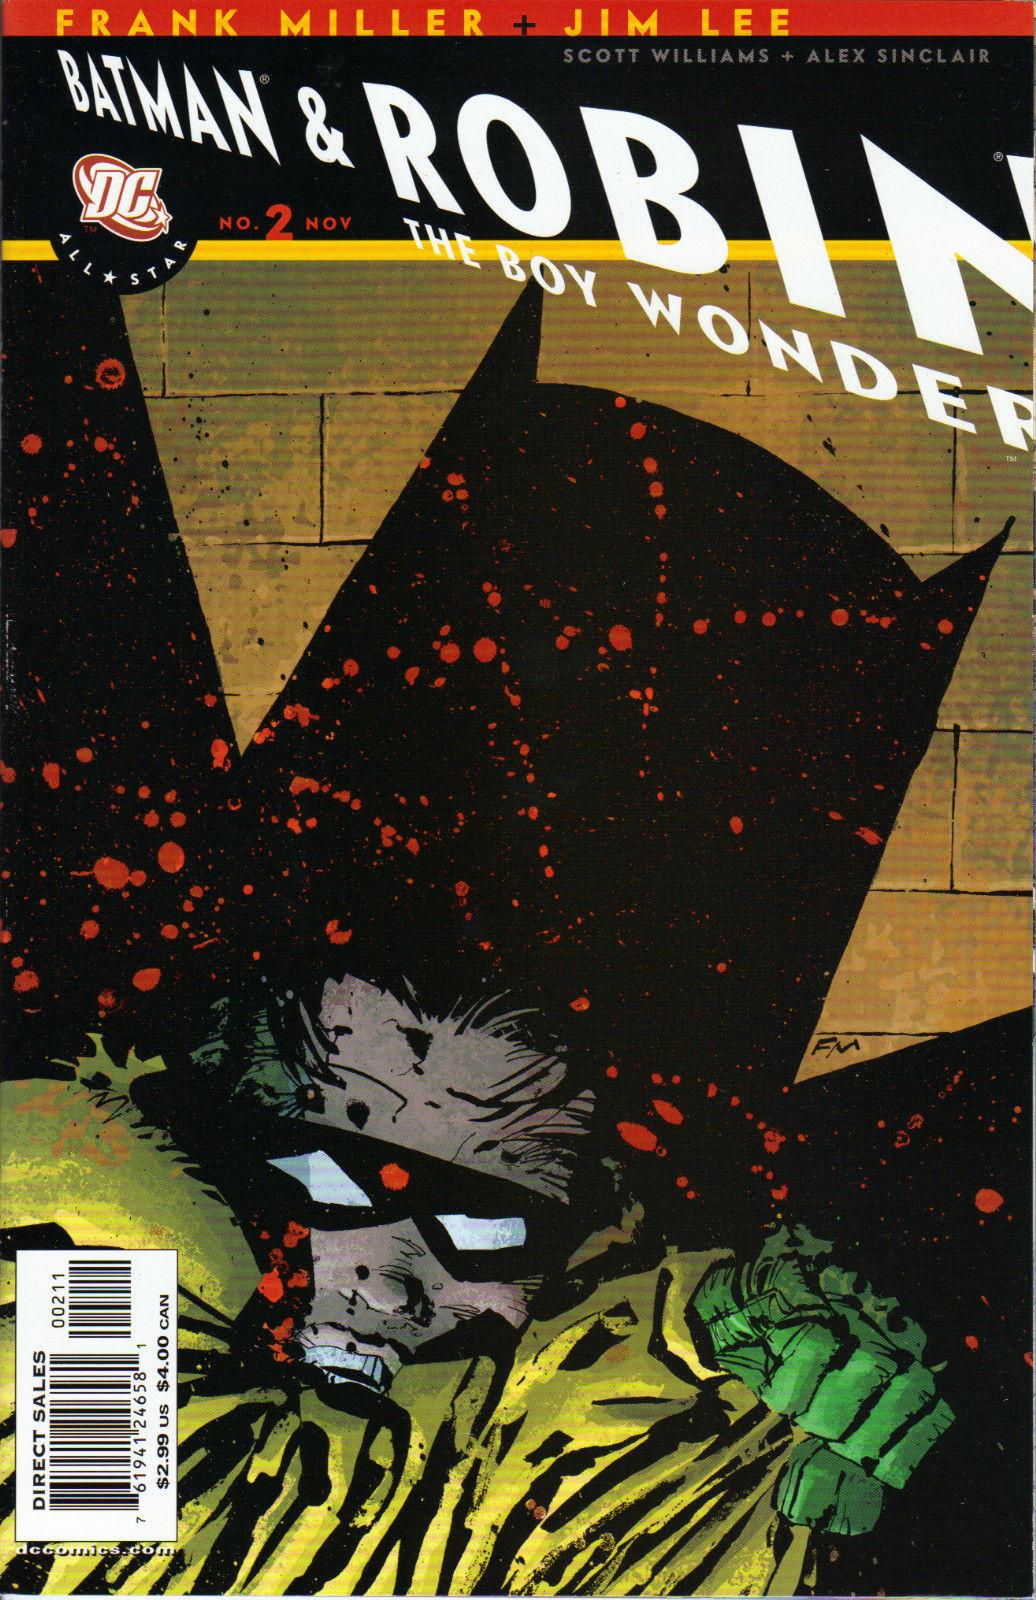 All Star Batman and Robin, the Boy Wonder/Covers | DC